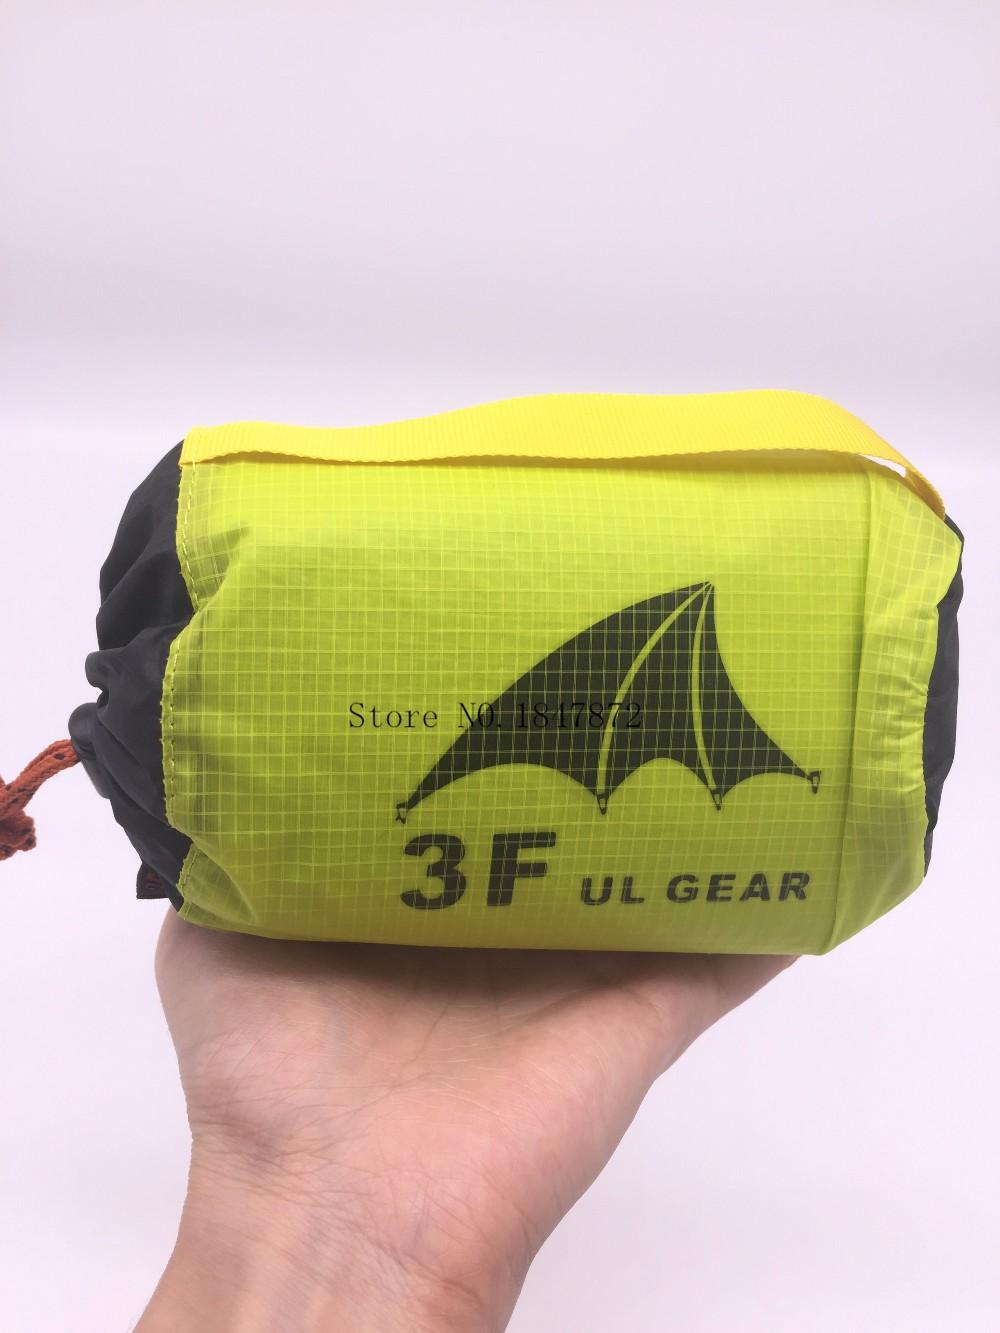 3f Ul Gear Ultralight 15d Poncho Nylon Rain Raincoat